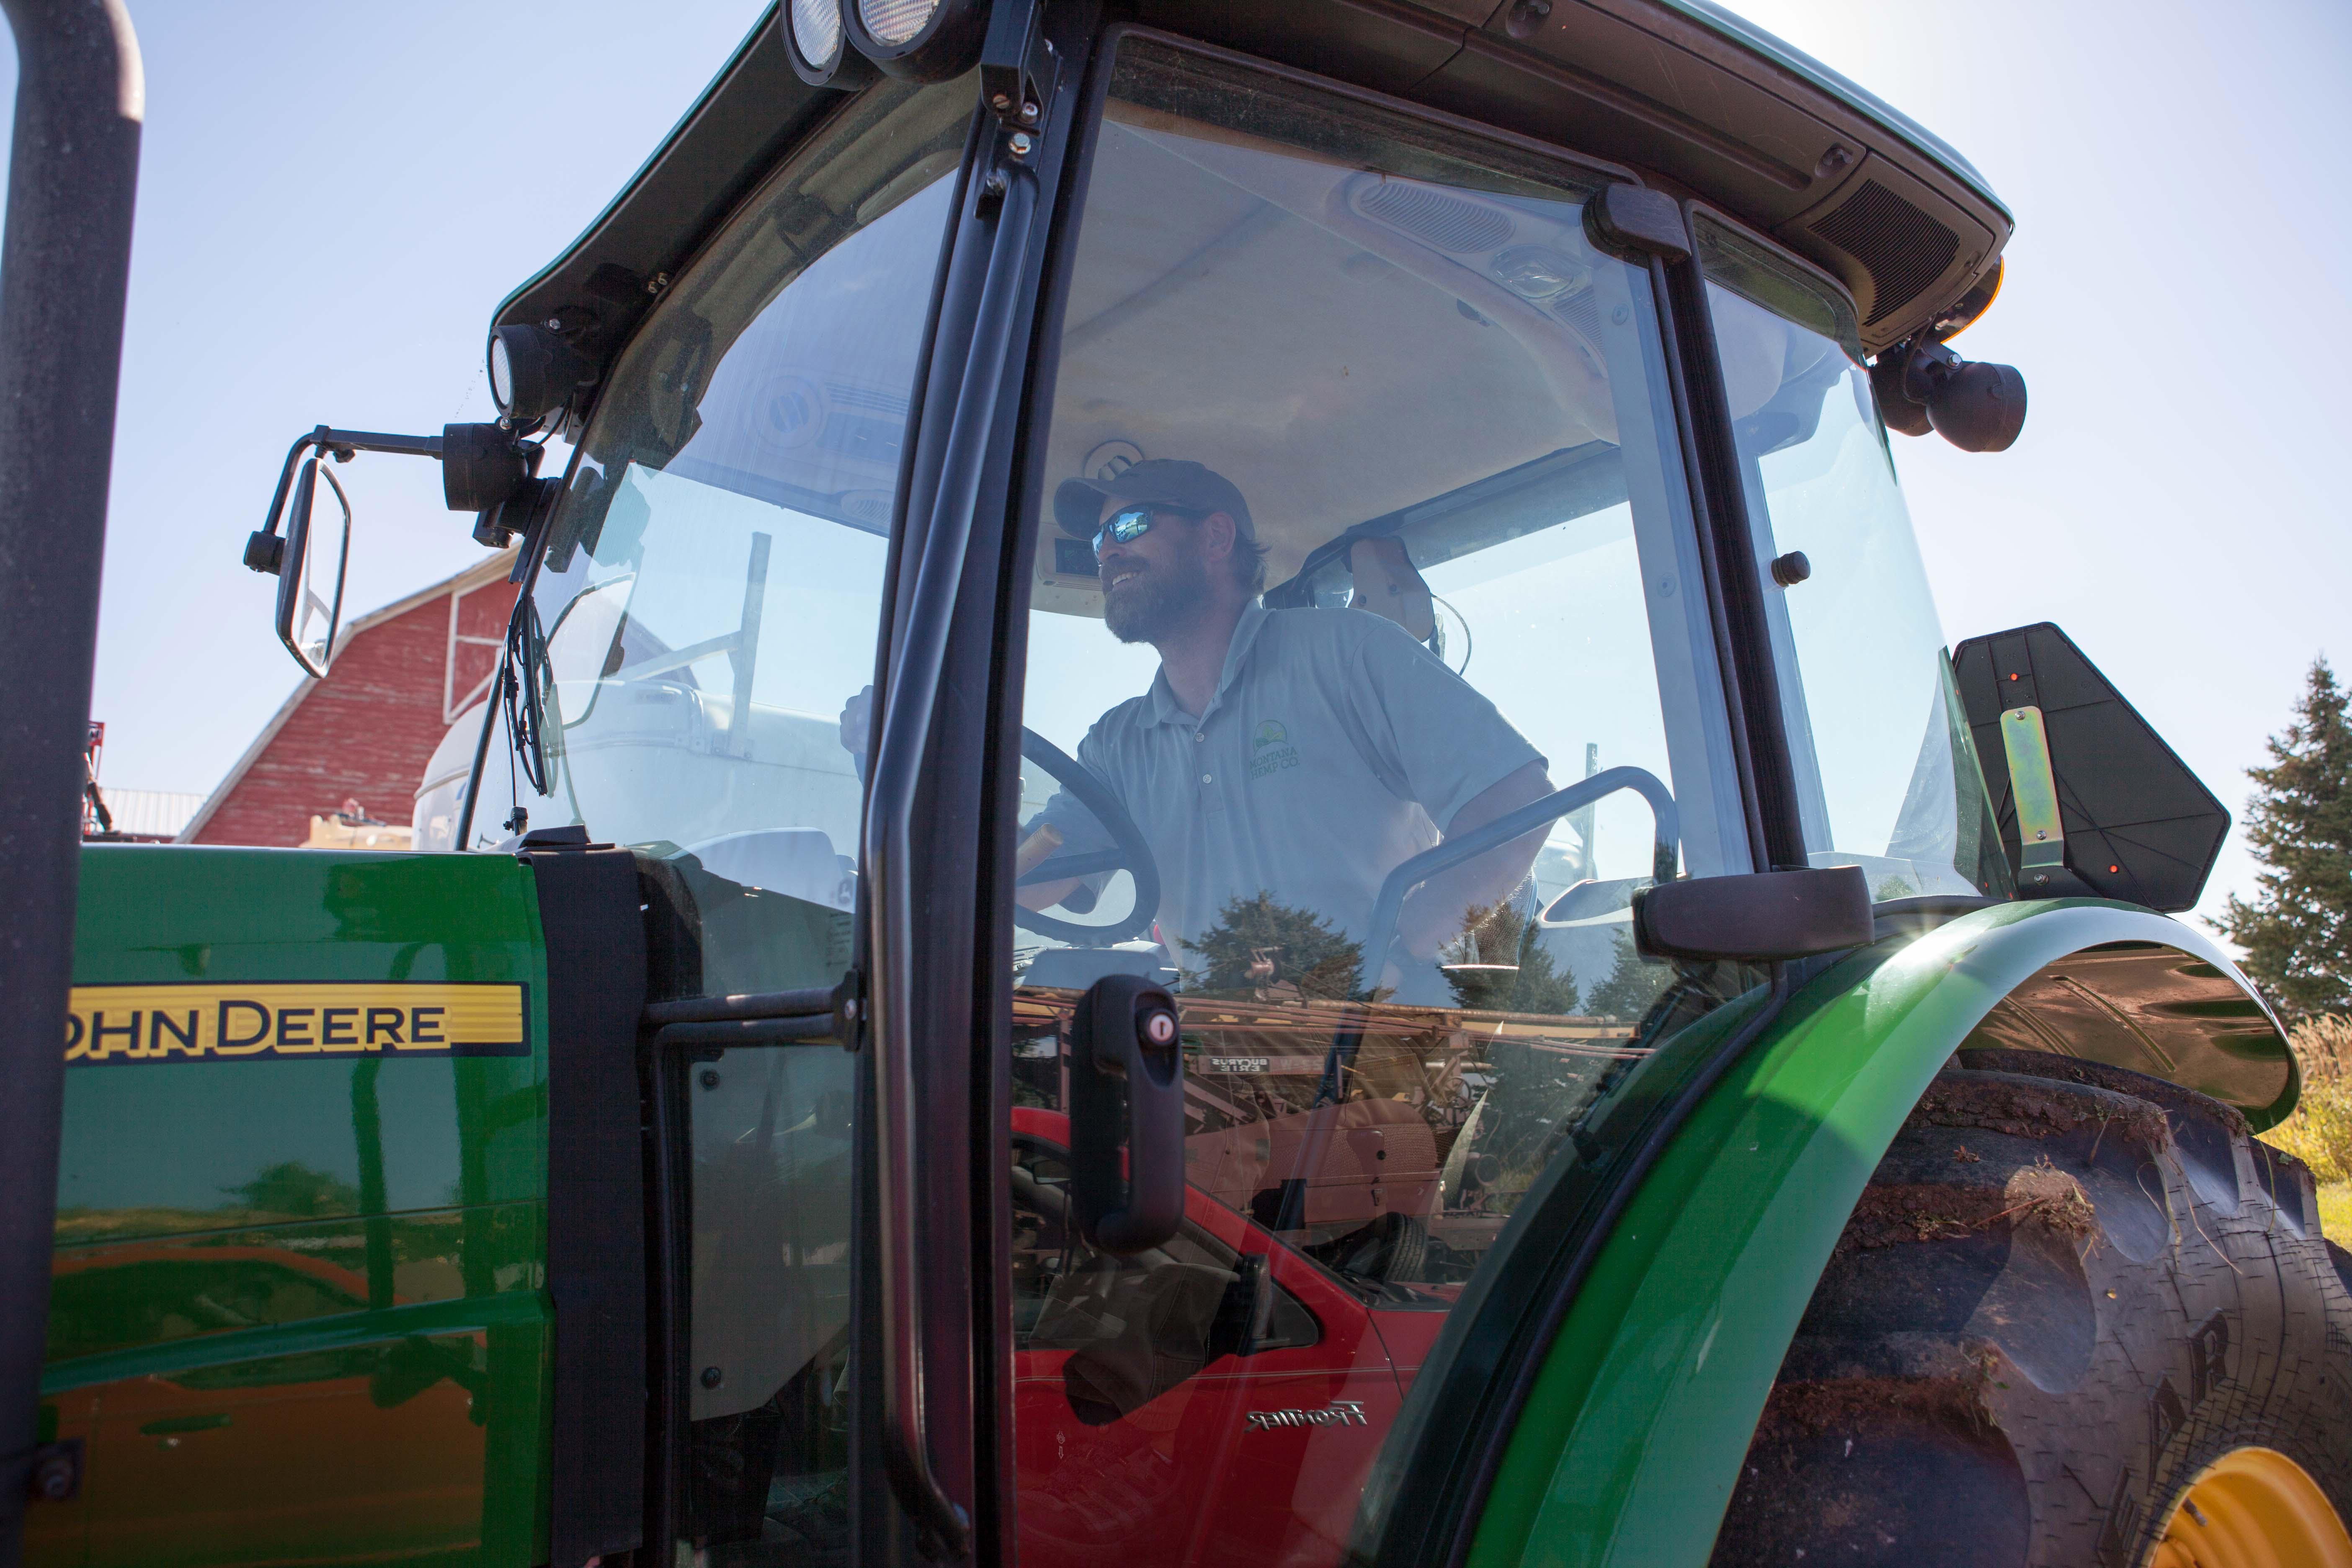 small farmers, Montana hemp, hobby farmers, state pilot programs